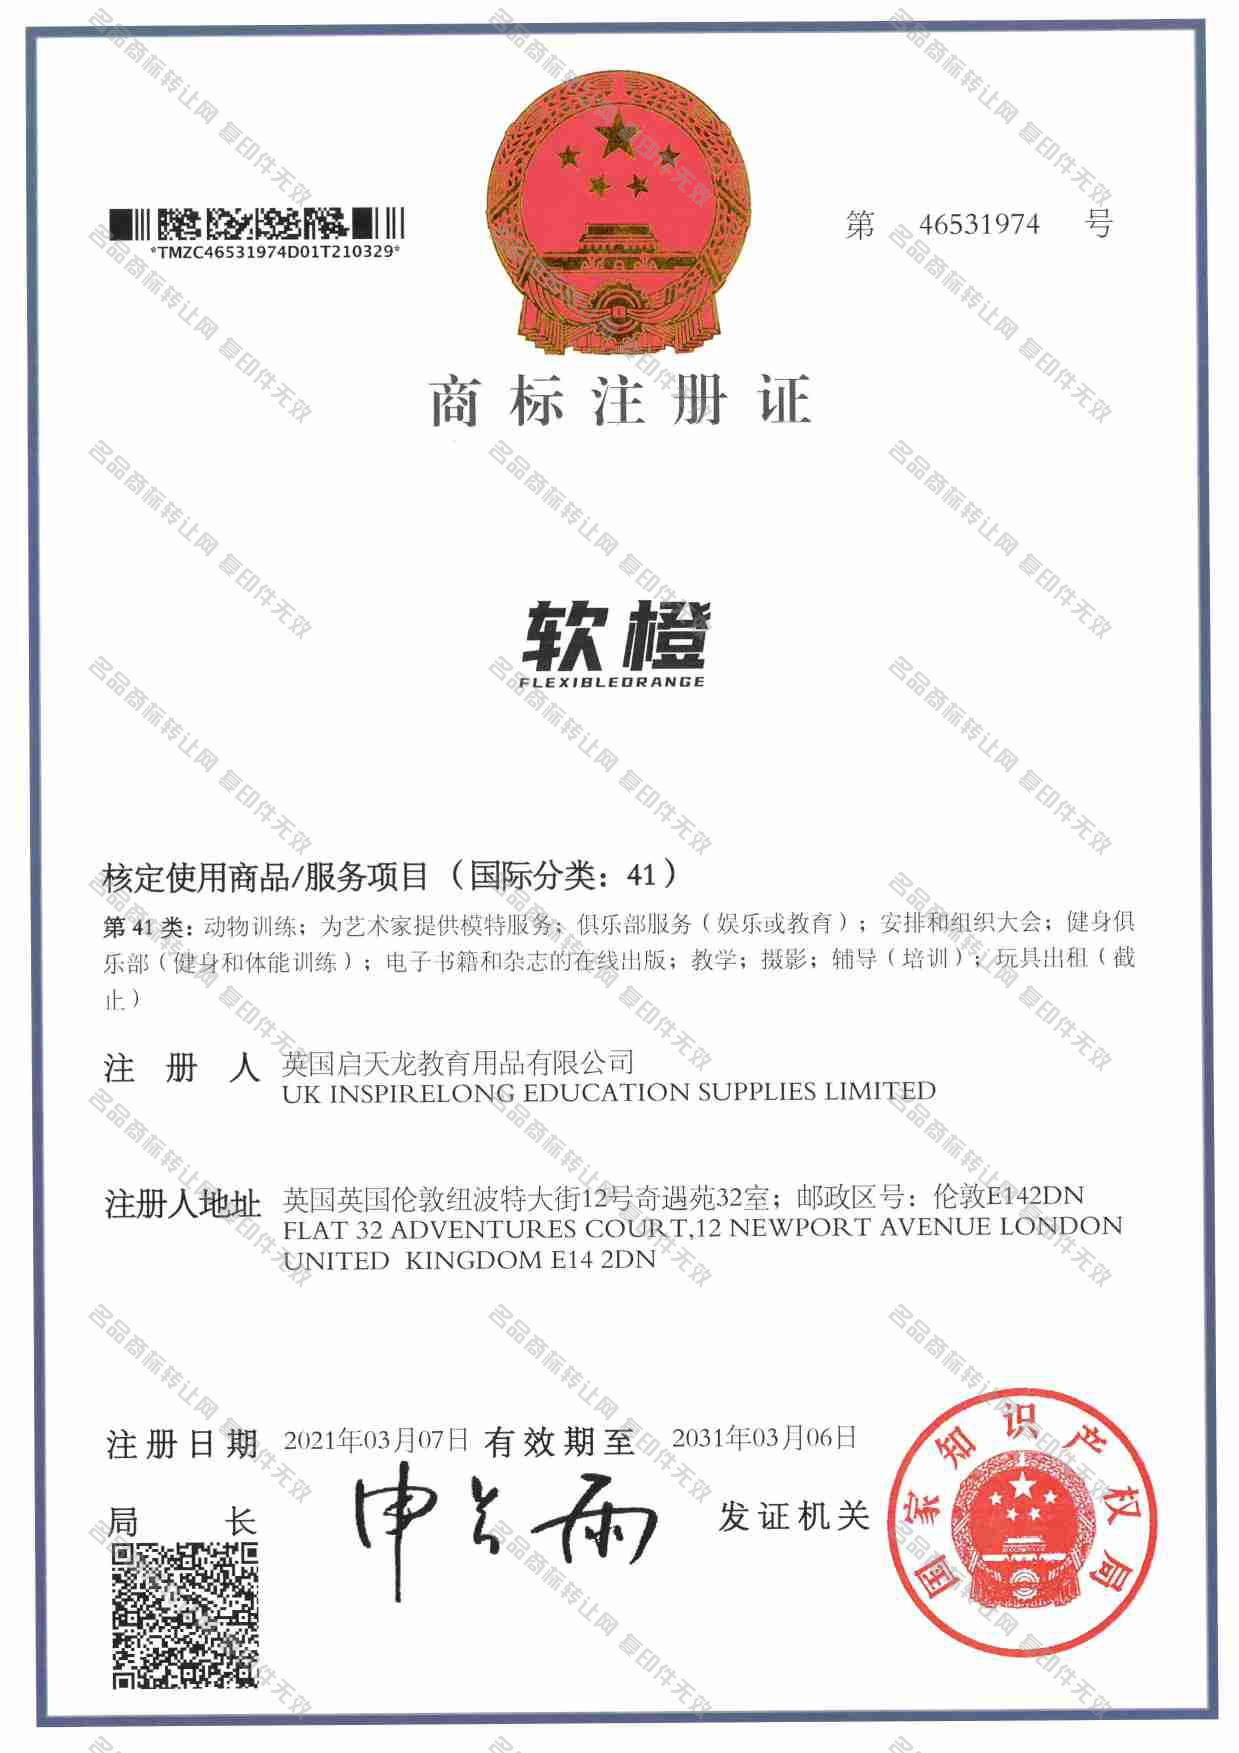 软橙 FLEXIBLEORANGE注册证